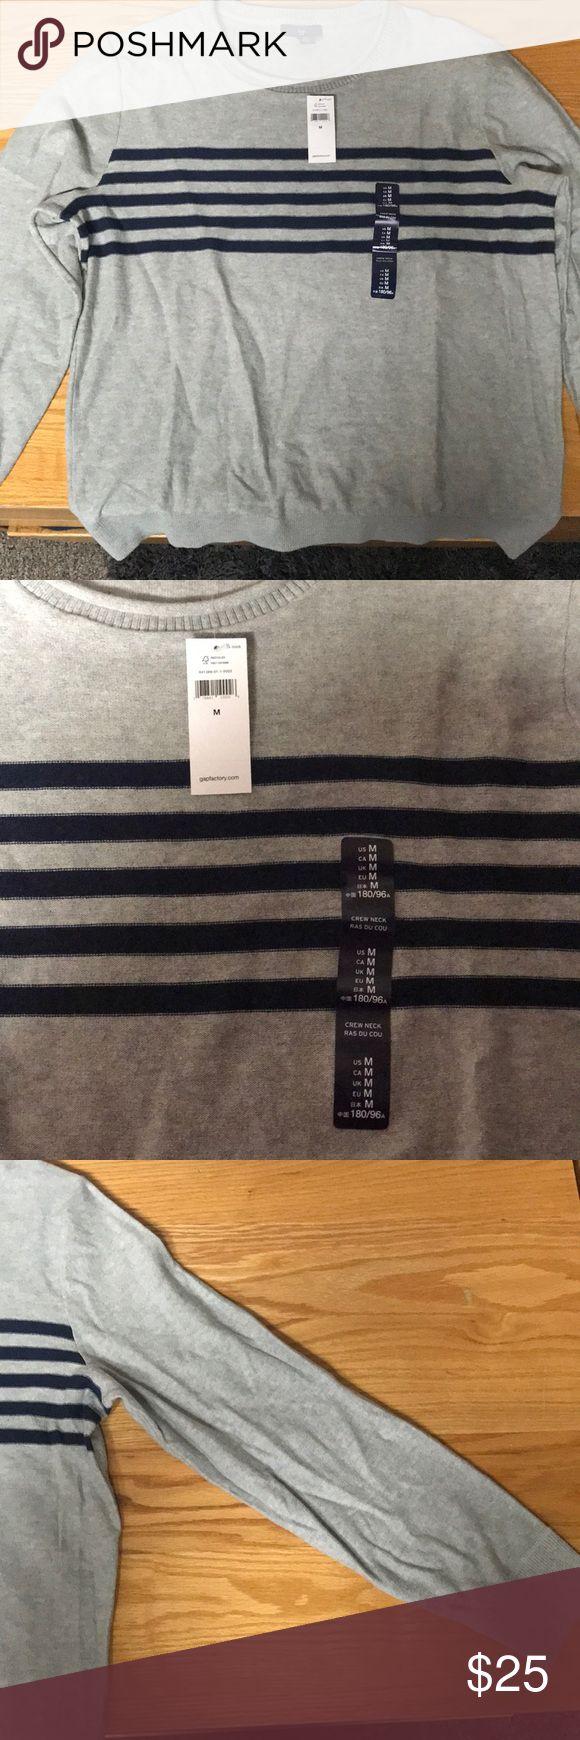 Gap Men's Long Sleeve Striped Sweater Brand new! Never worn! GAP Sweaters